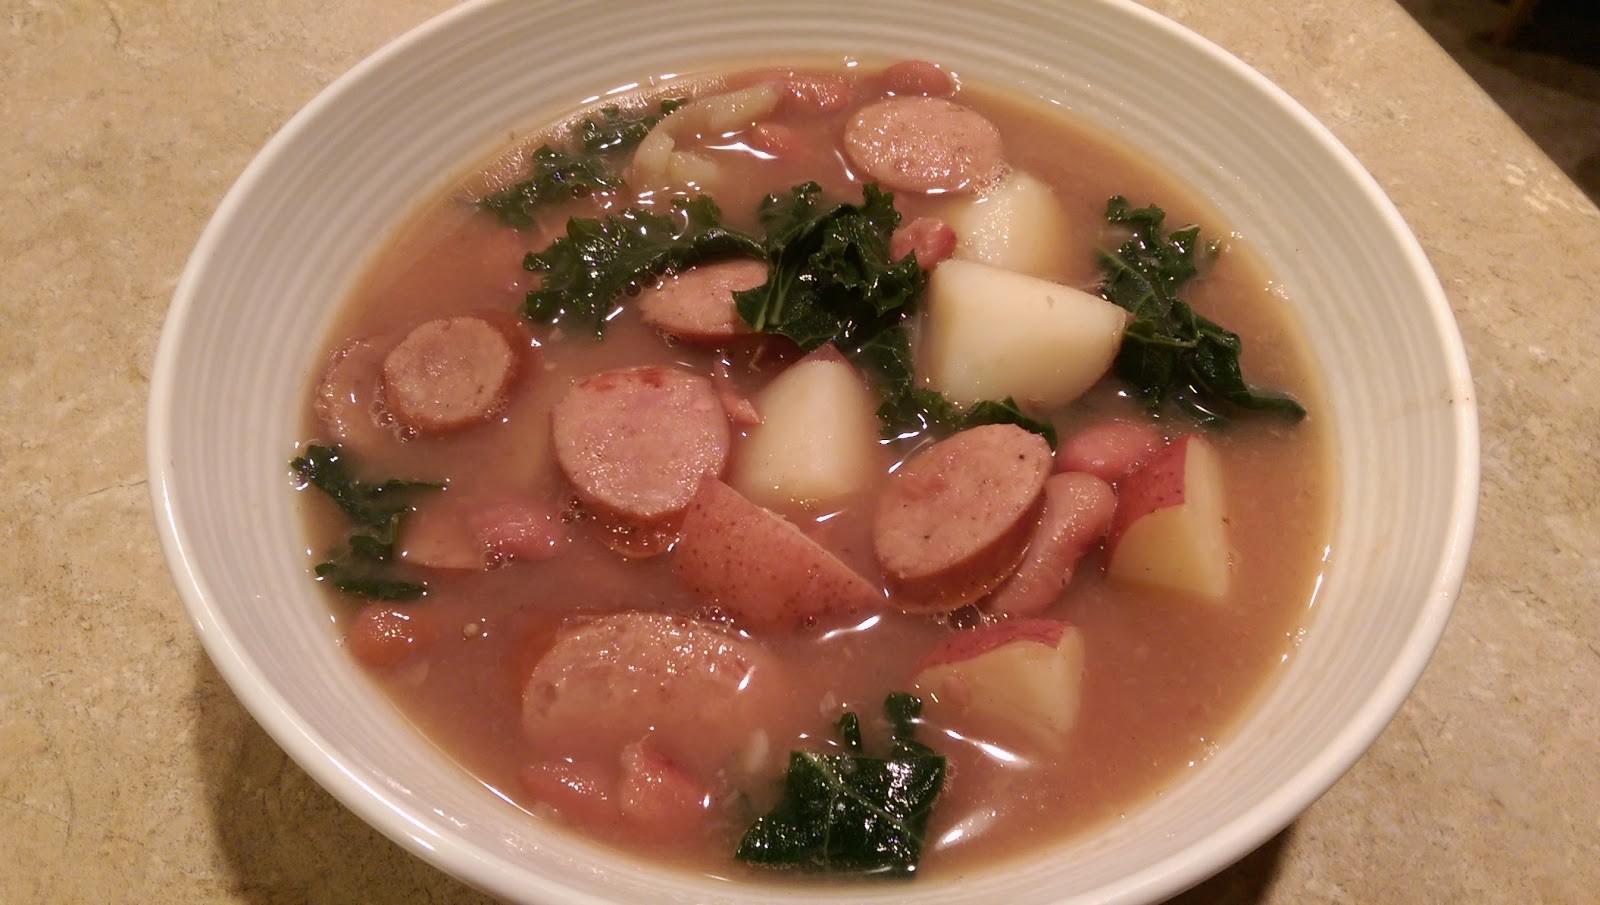 alton browns christmas soup between friends copy me that - Alton Brown Christmas Soup